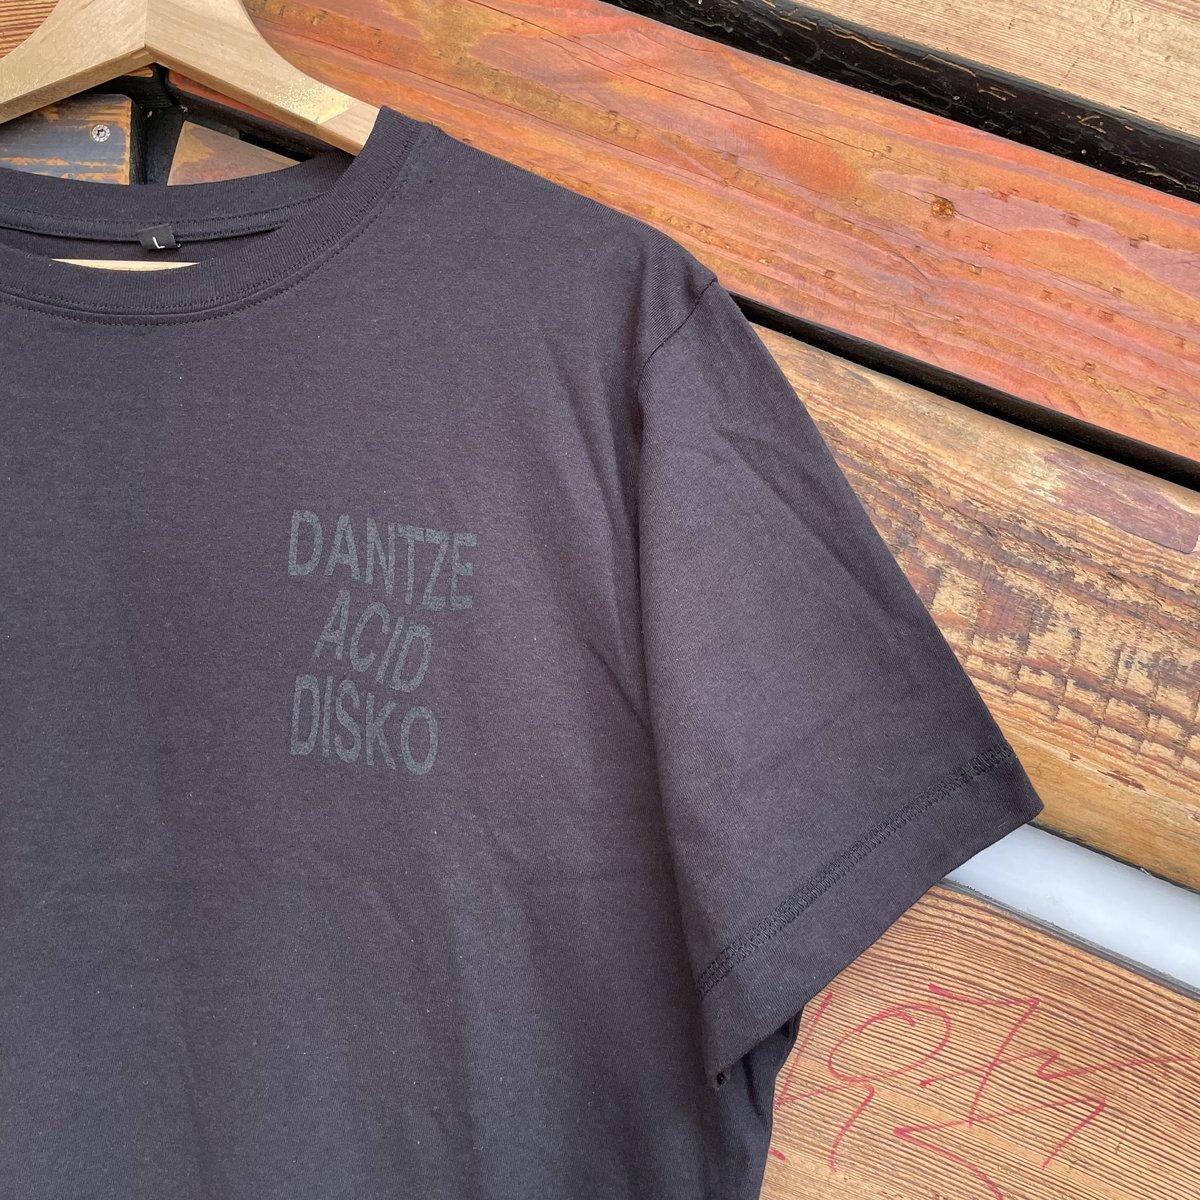 """Dantze Acid Disko"" Shirt black - by Dantze"